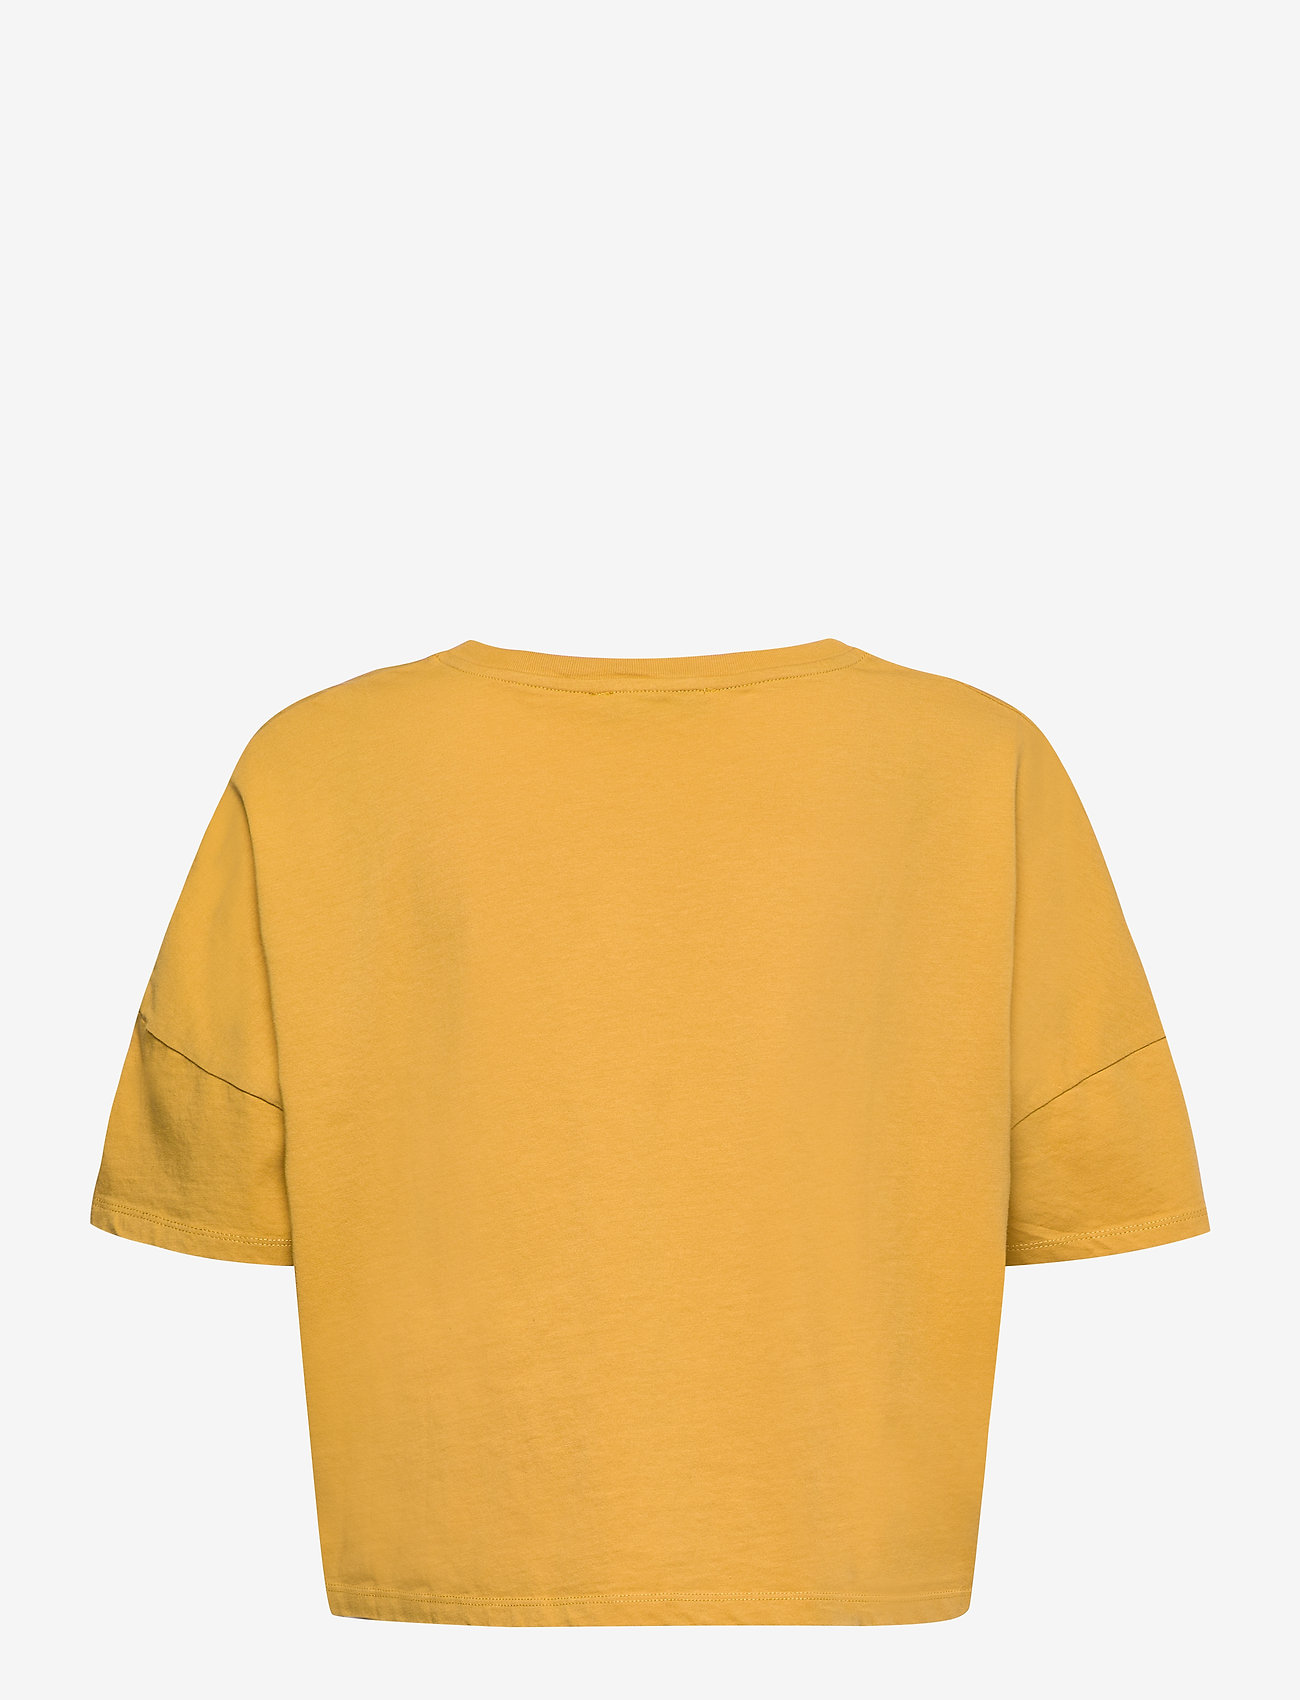 Max&Co. - DAVVERO - navel shirts - pale yellow - 1